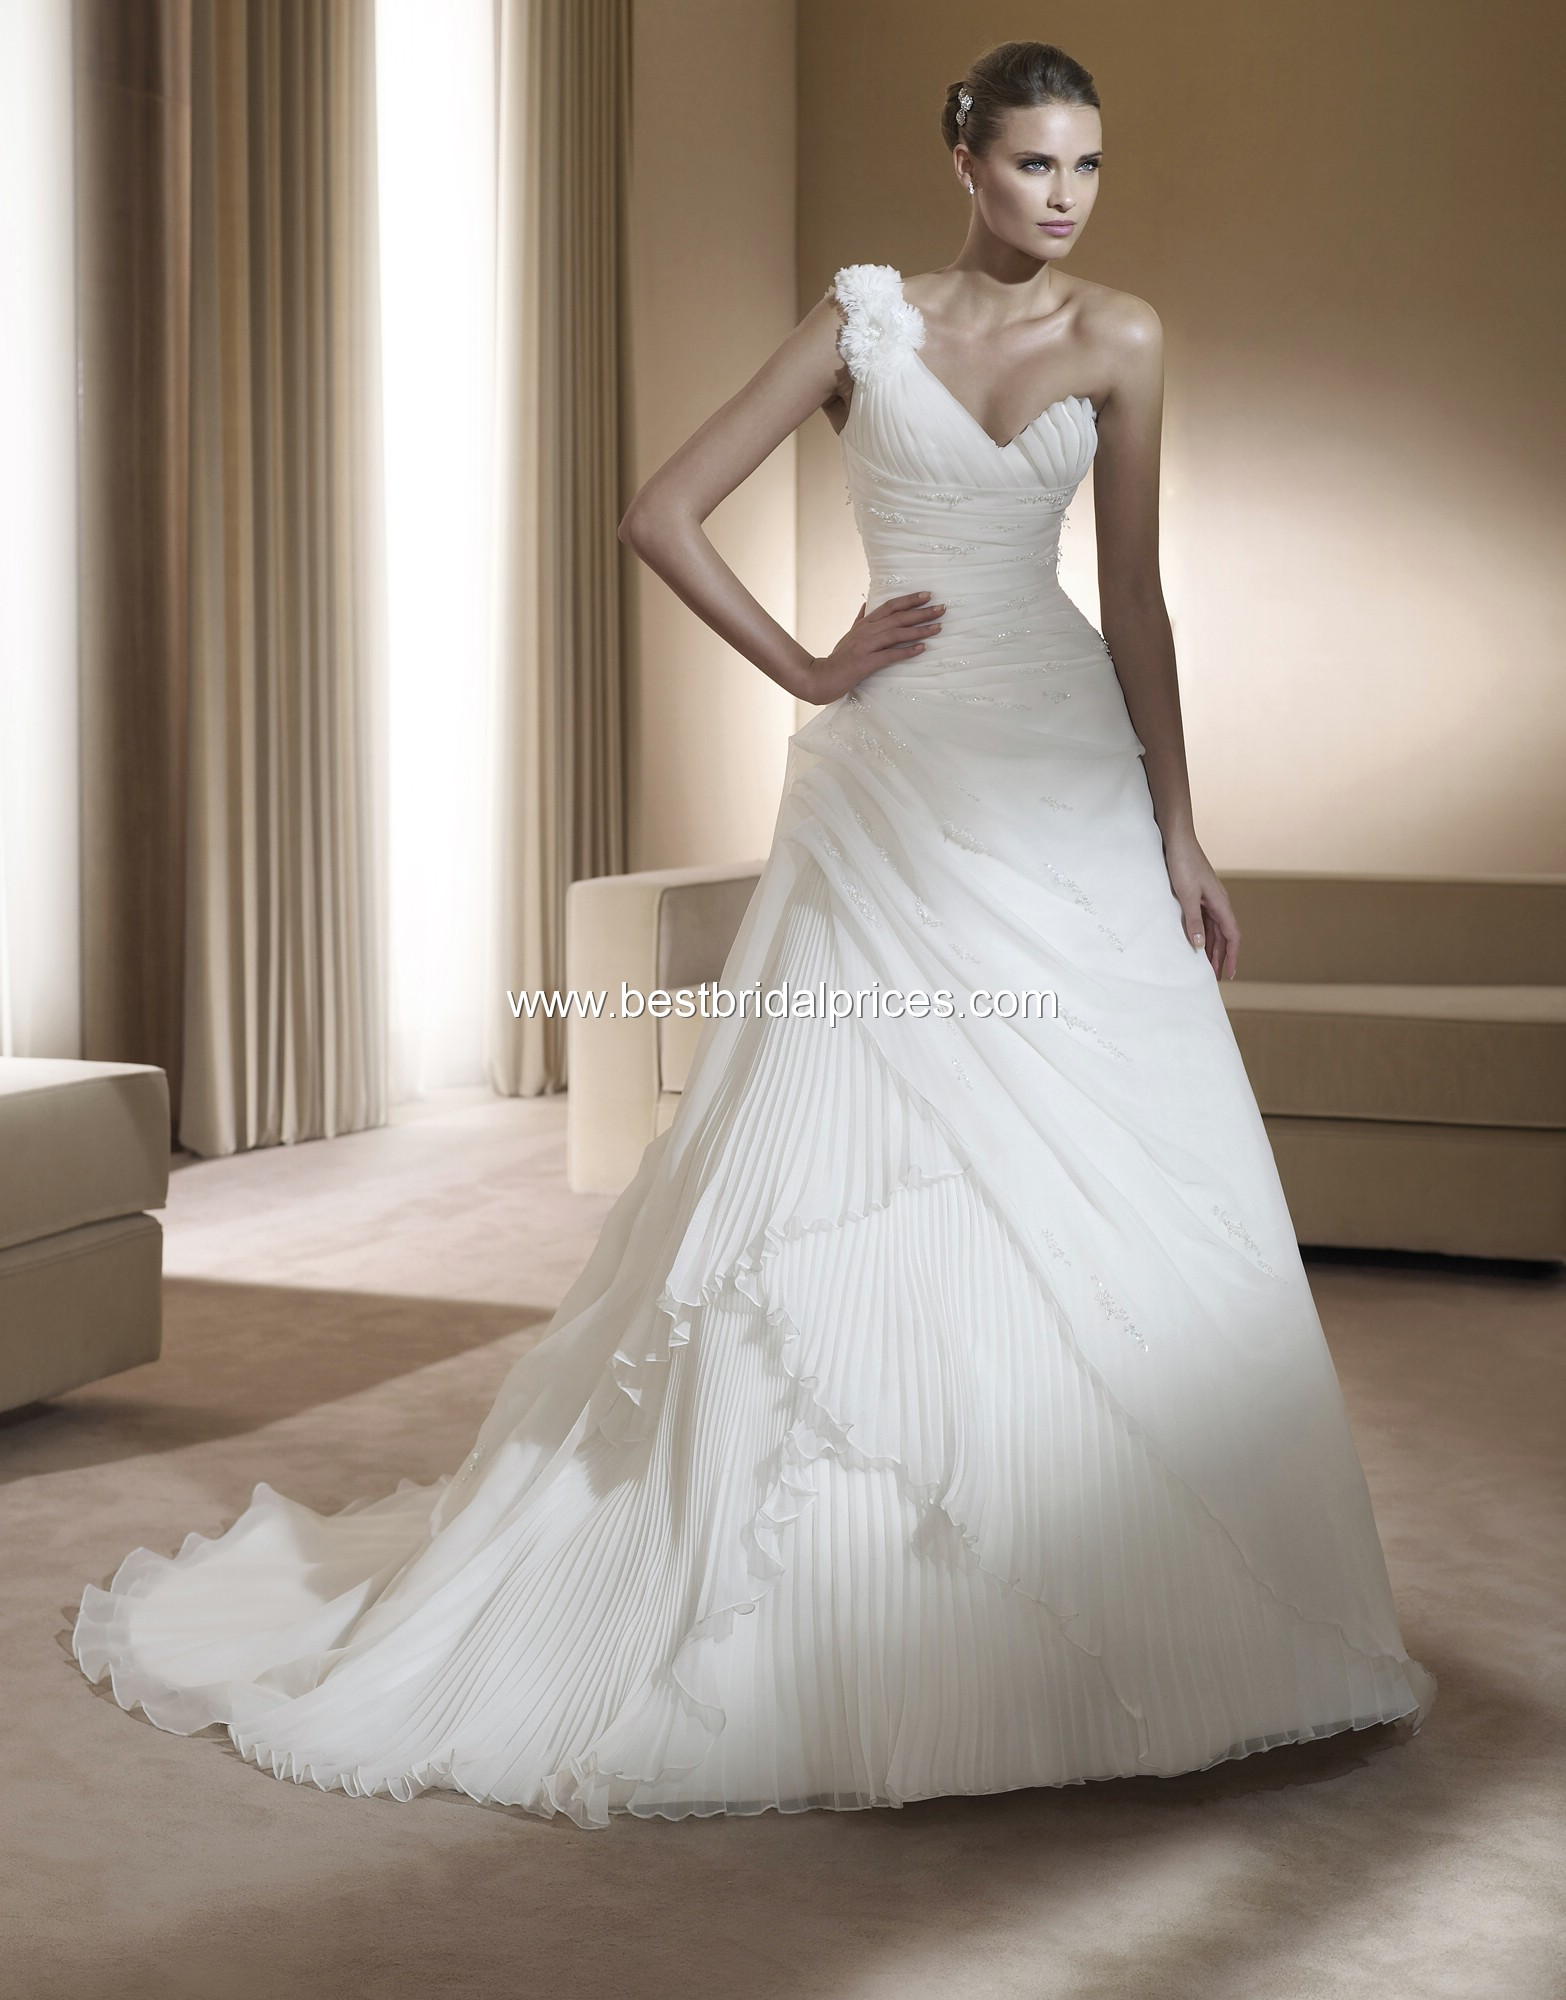 pronovias wedding dresses photo - 1